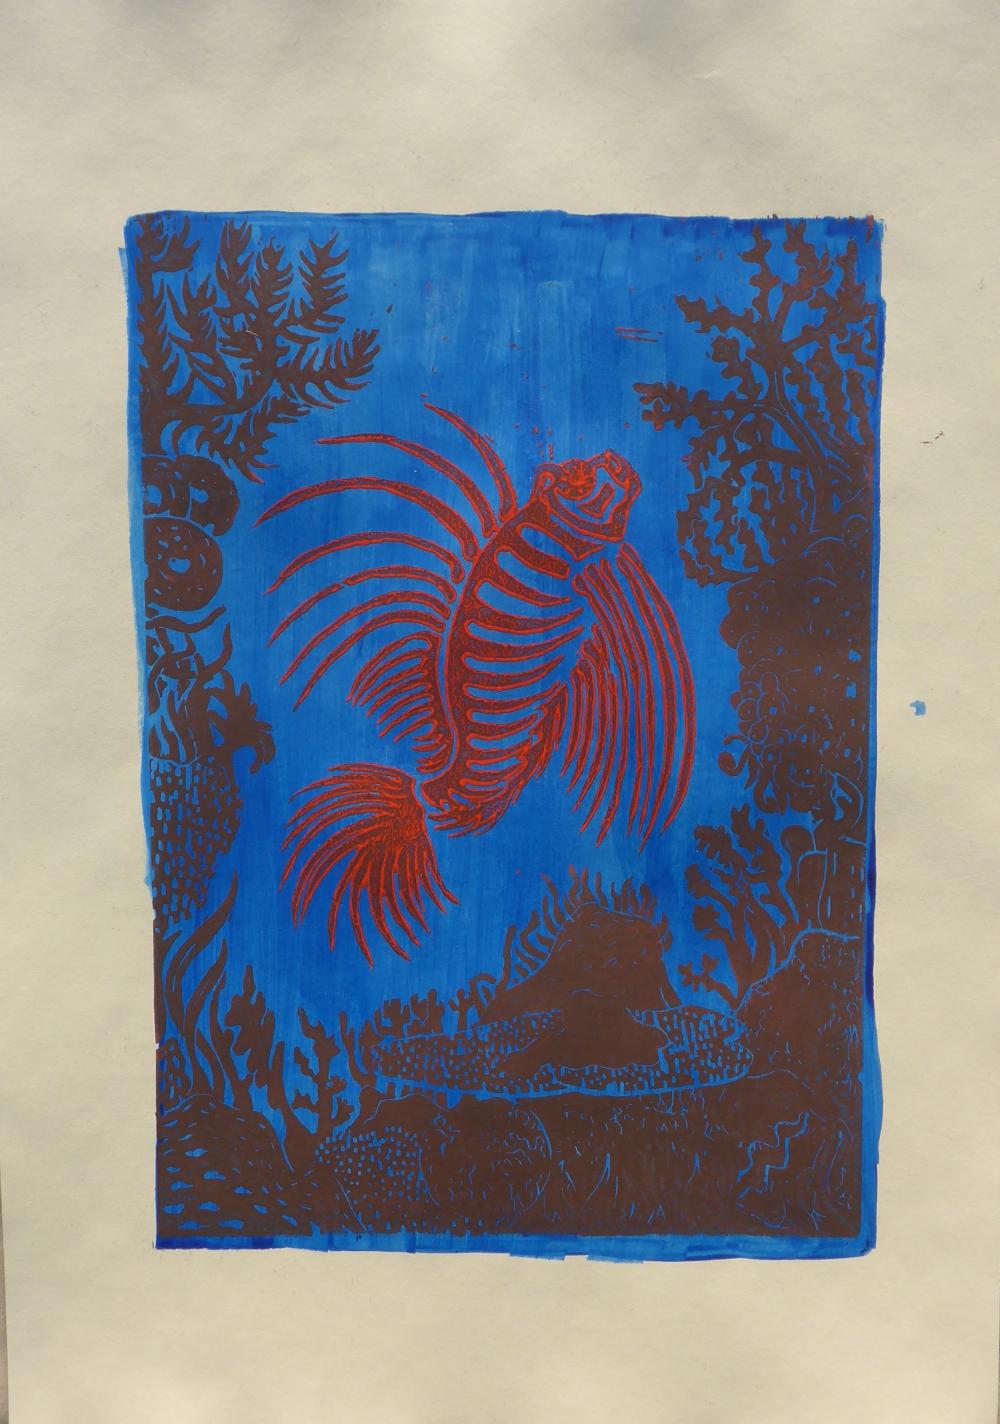 """Das Riff II"", 2019, Linolschnitt + Acryl auf Papier, 30 x 42 cm"